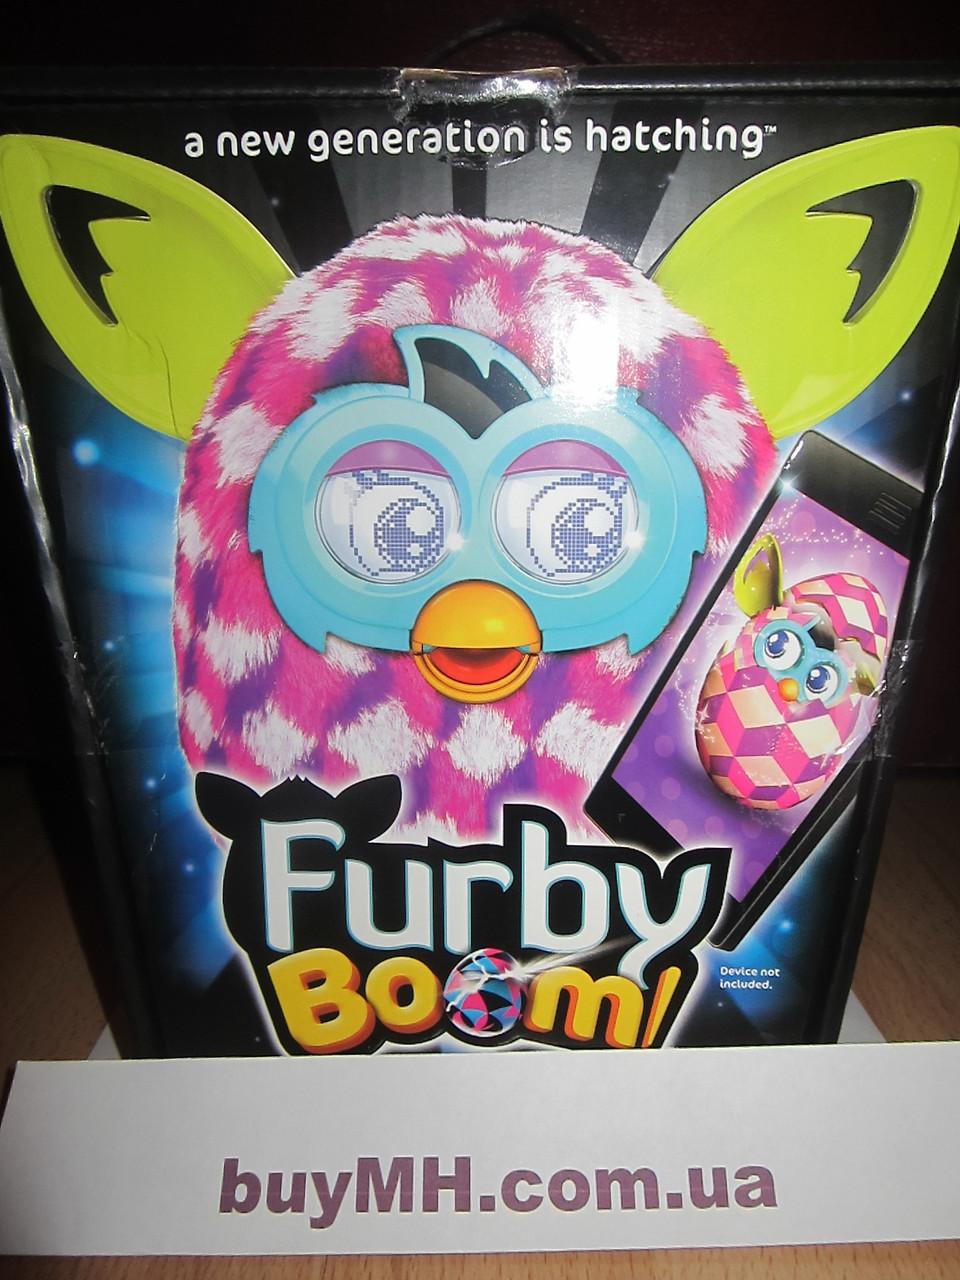 Ферби Бум розовые кубики (Furby Boom Pink Cubes), фото 1